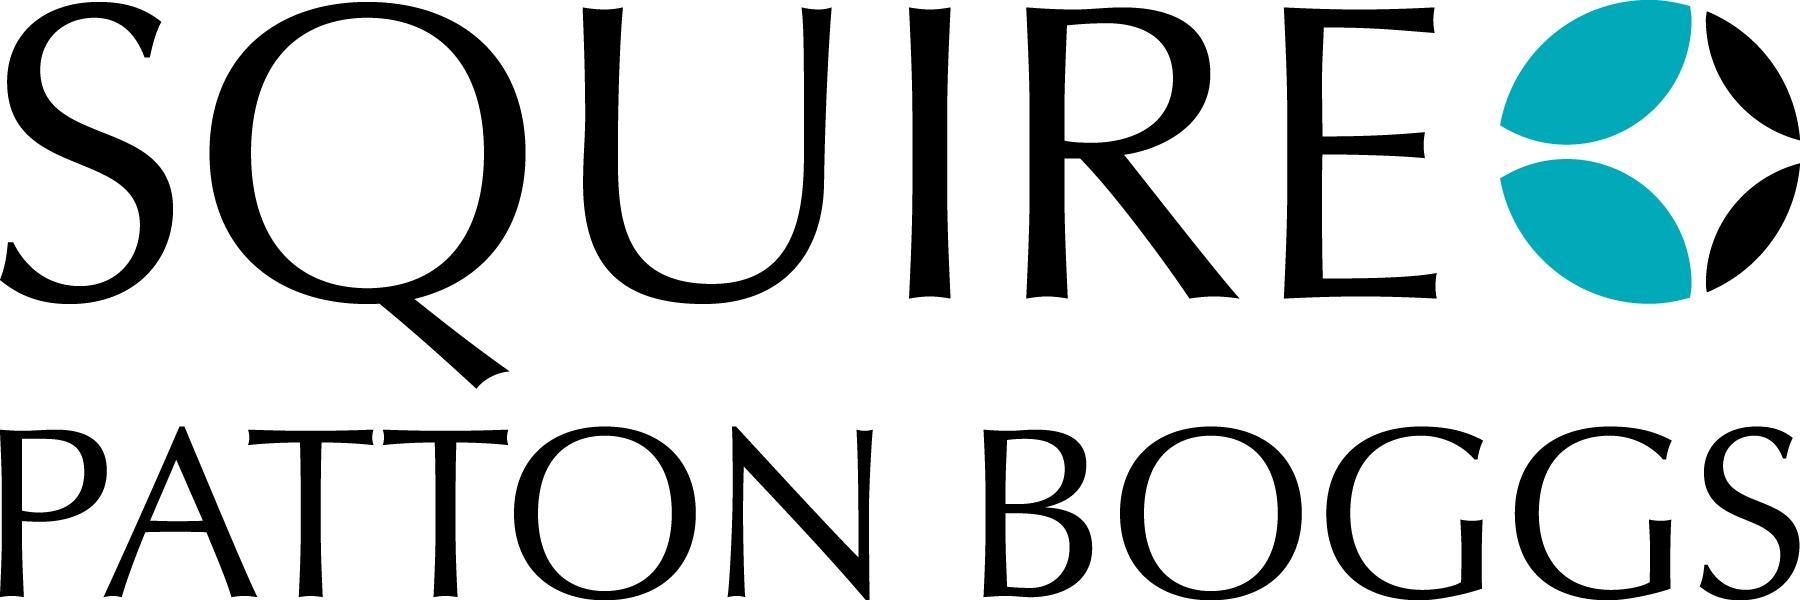 squire-logo